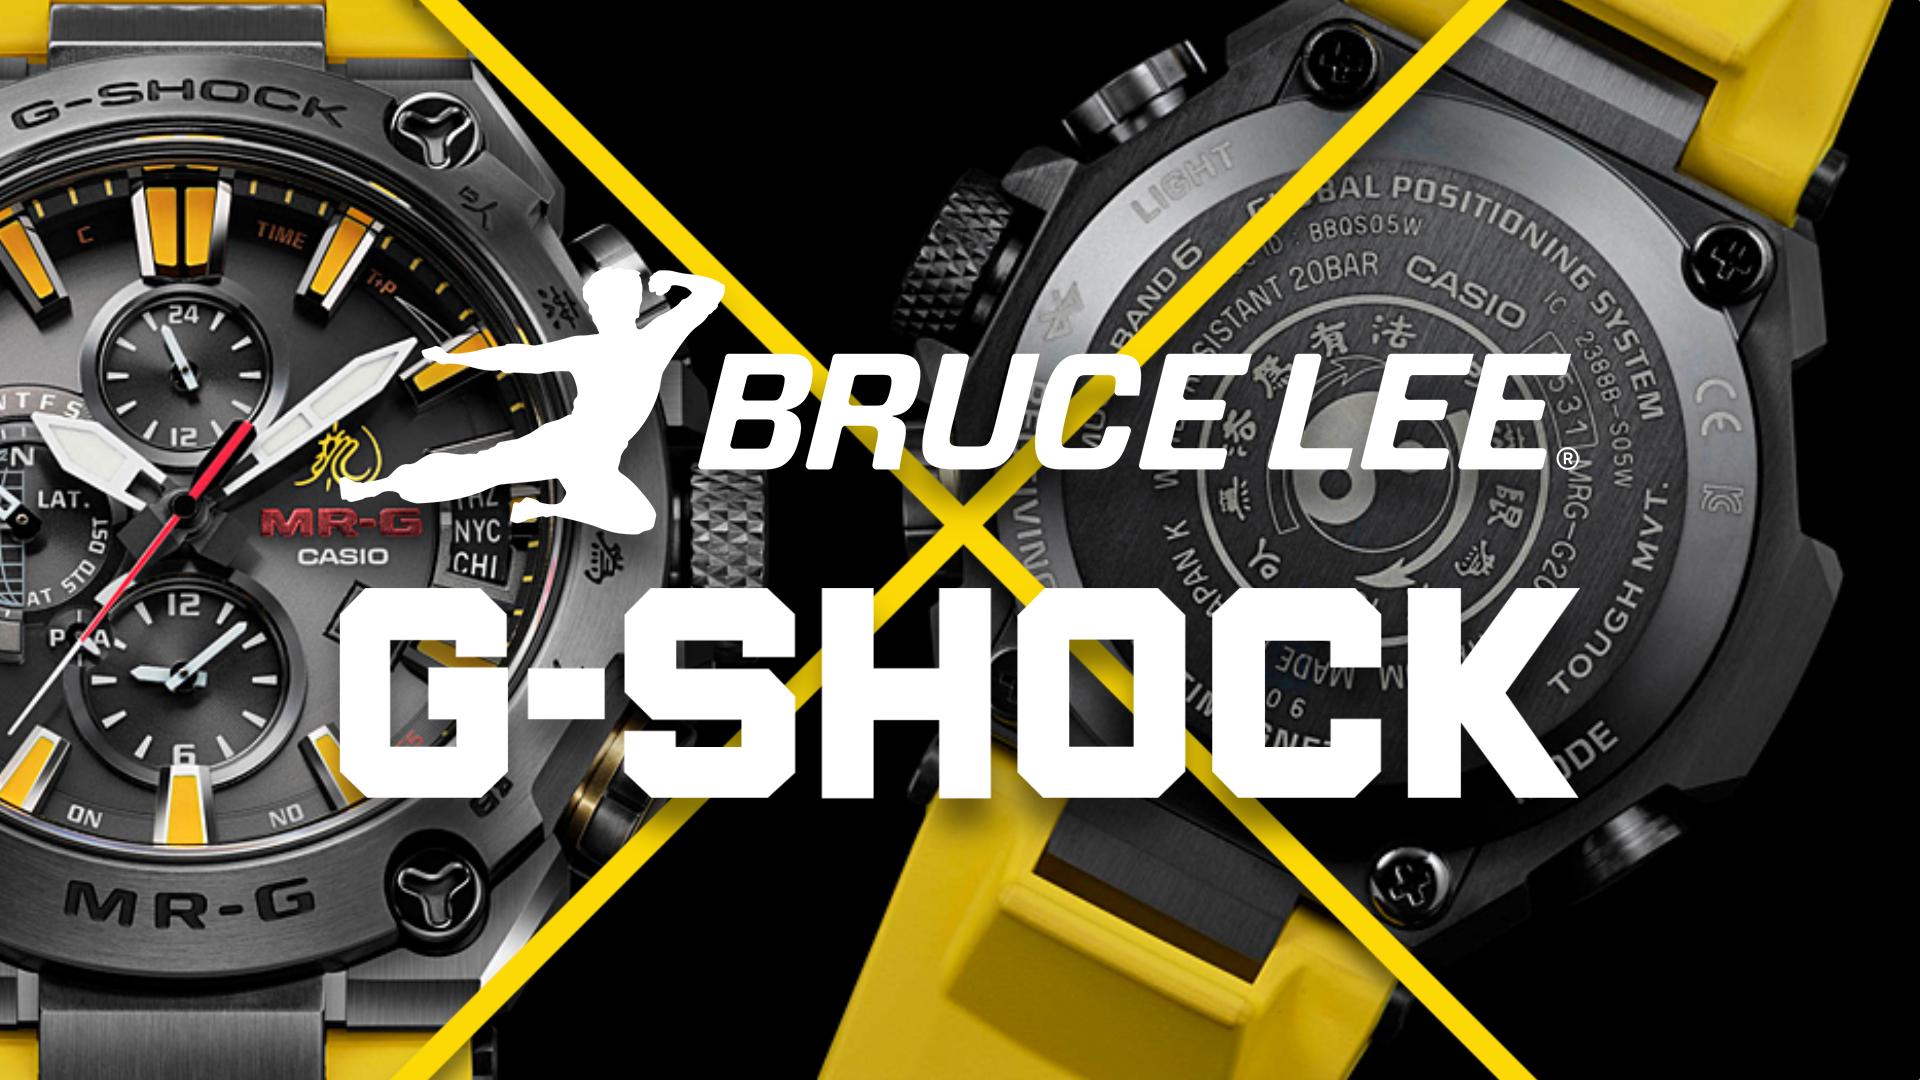 Bruce Lee X G-Shock